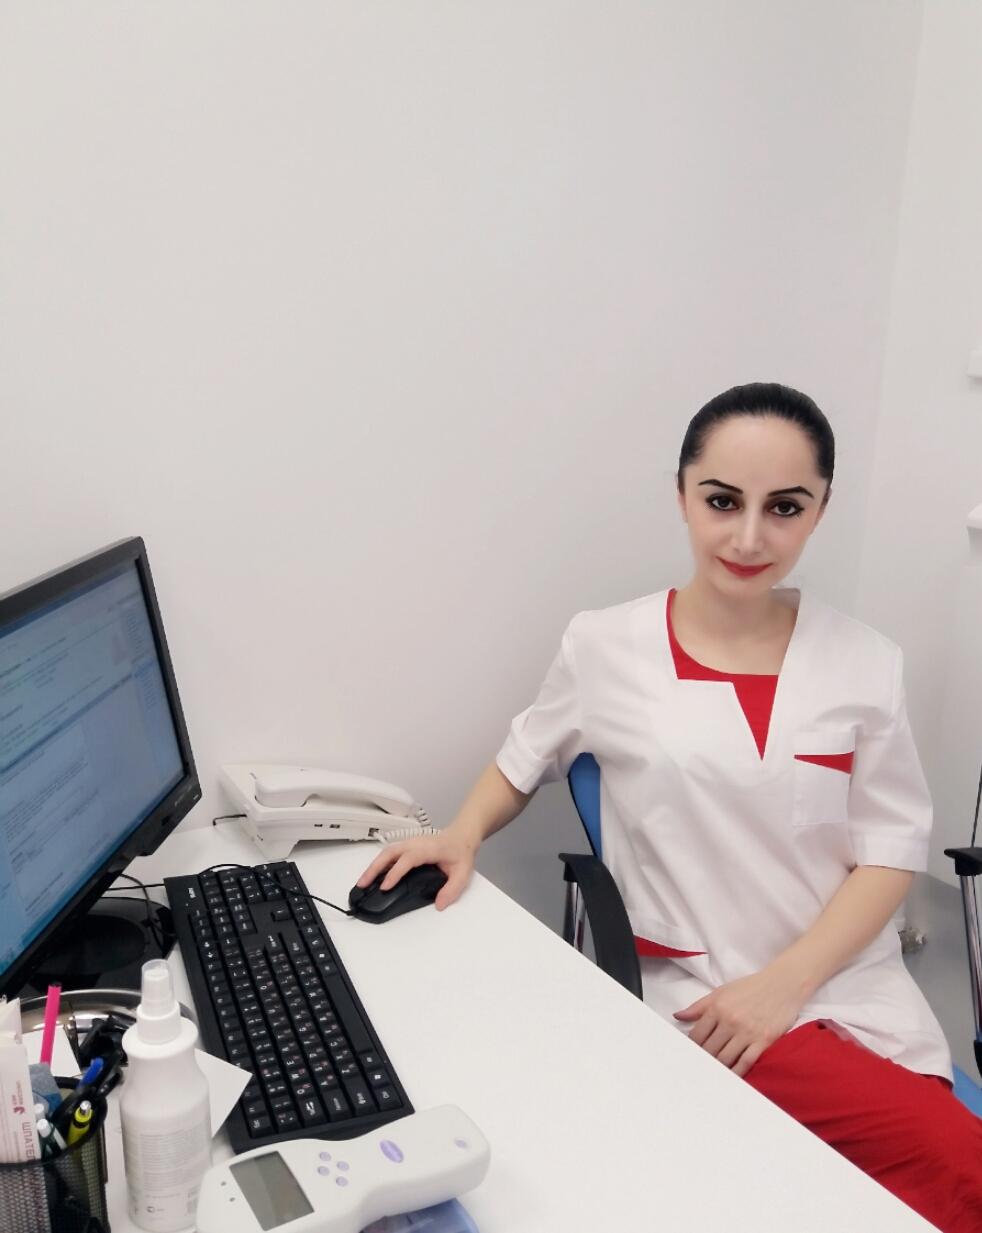 Мухумаева Заира Магомедзапировна – врач-педиатр